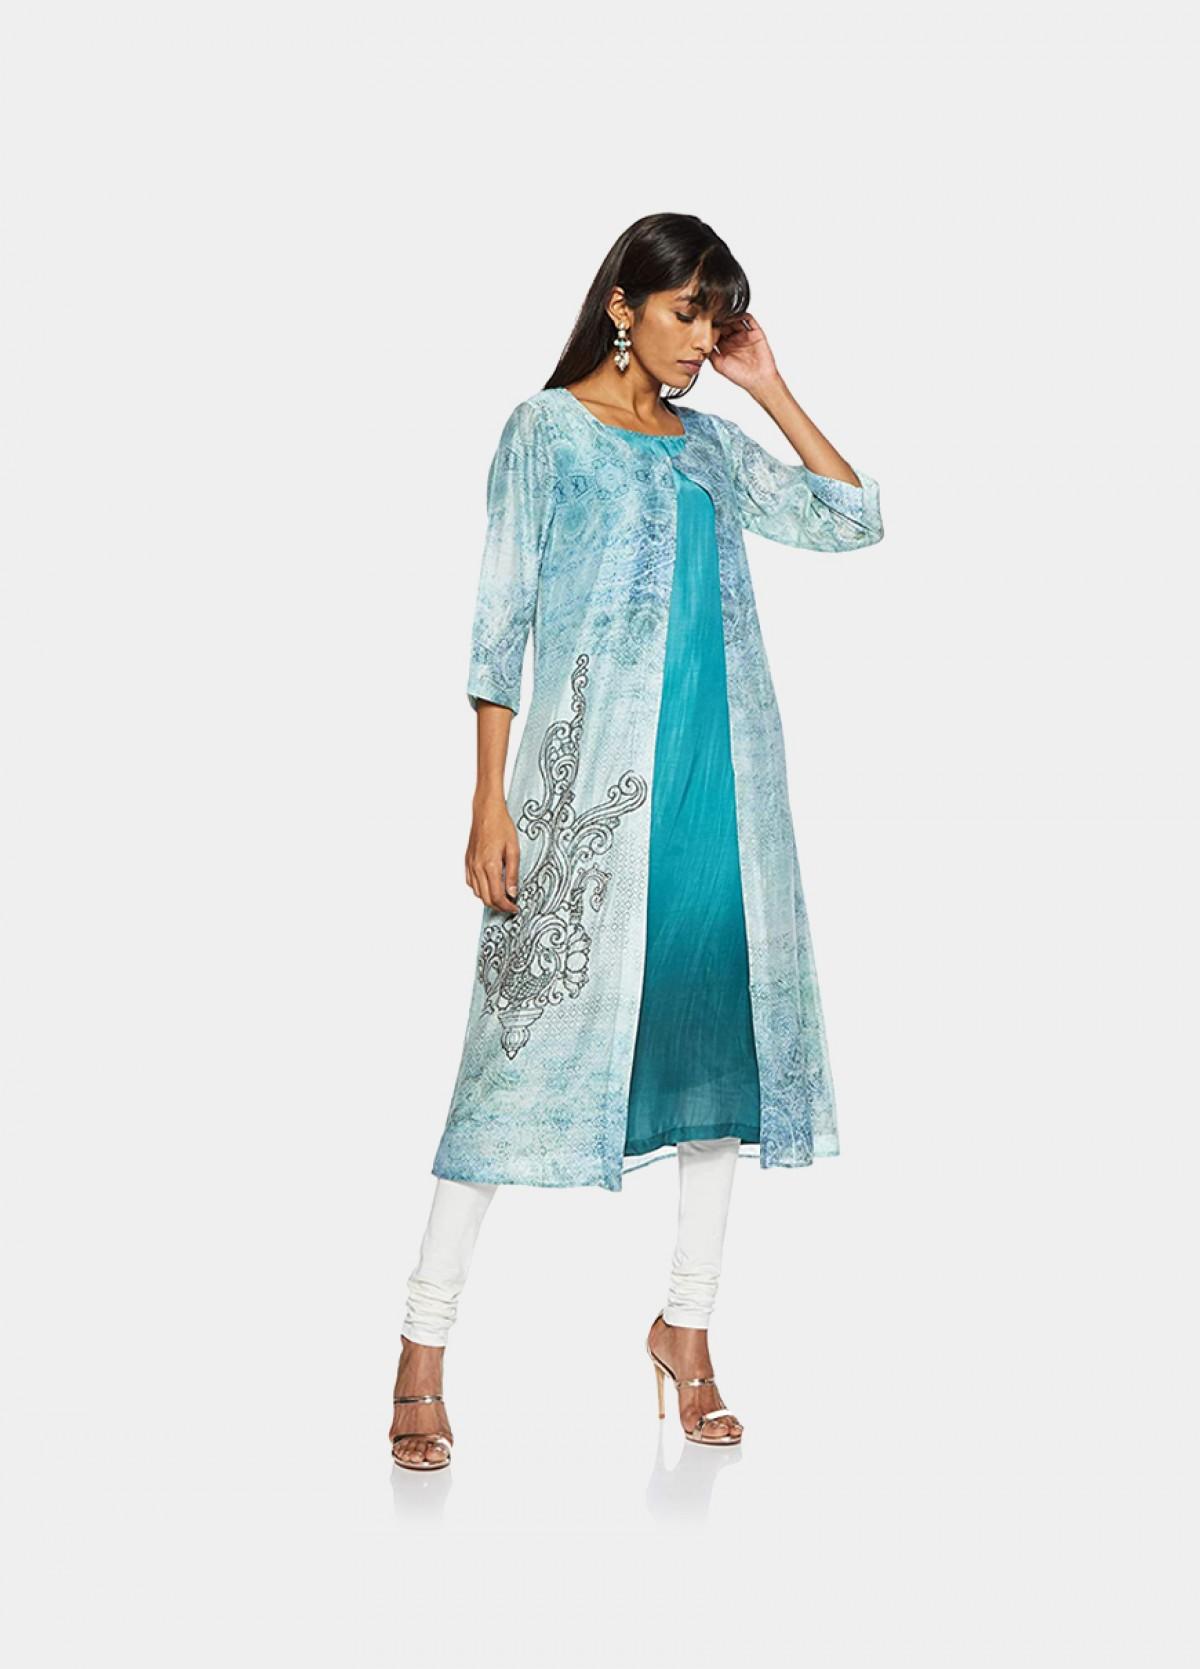 The Women'S Blue Chanderi Shrug